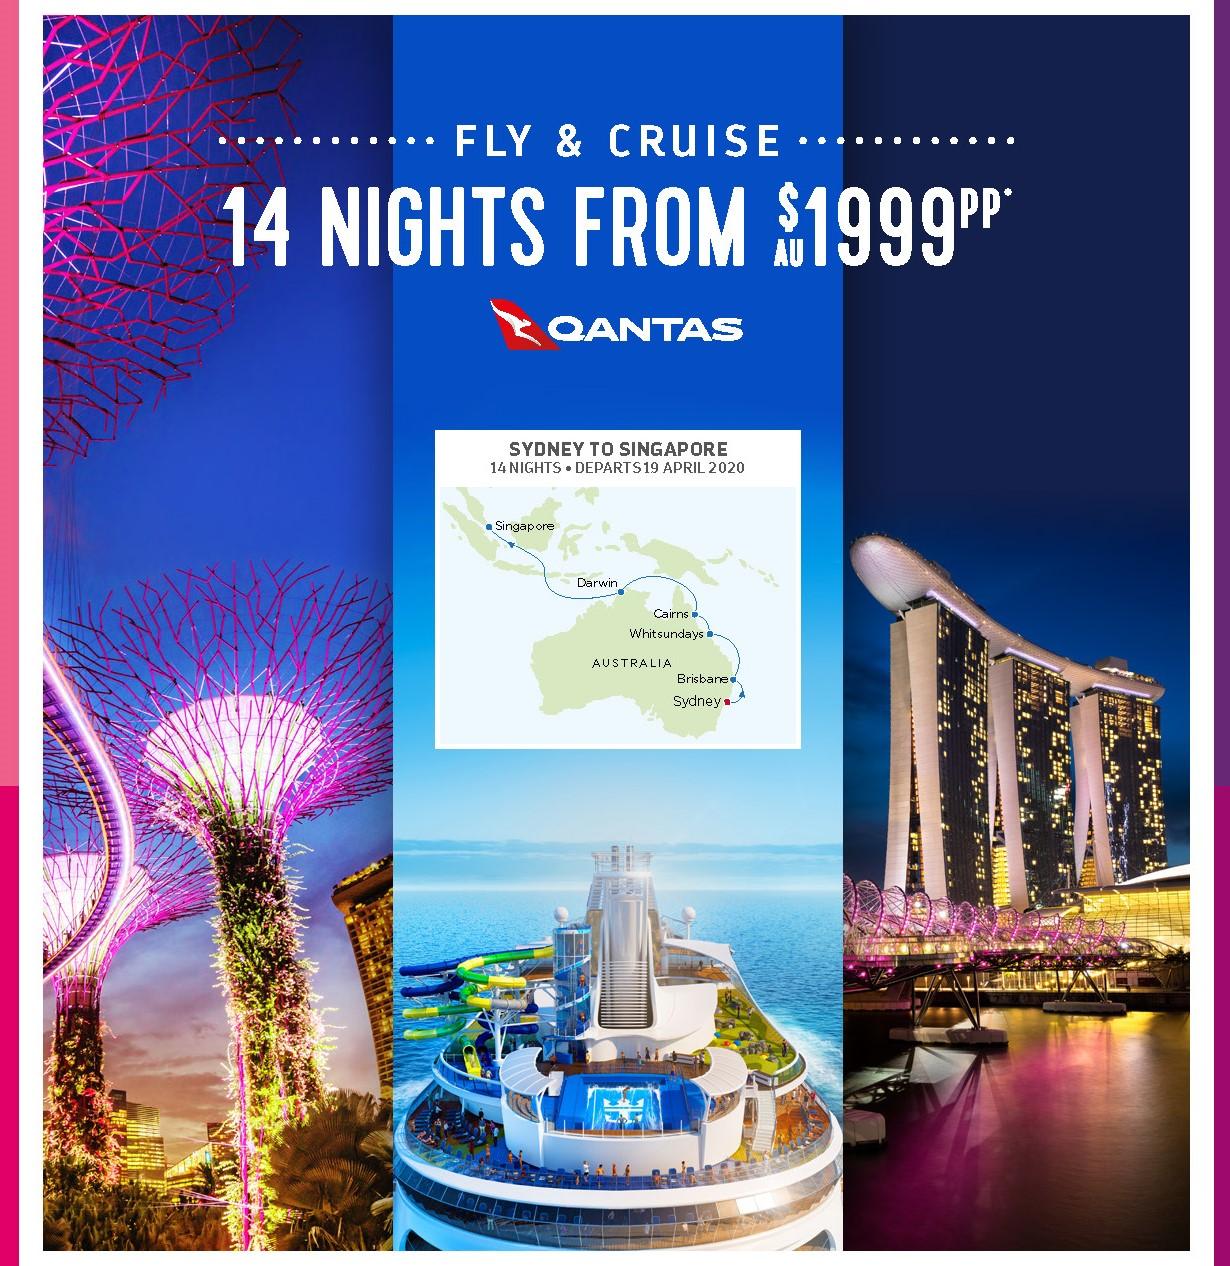 royal-caribbean-qantas-fly-cruise-offer